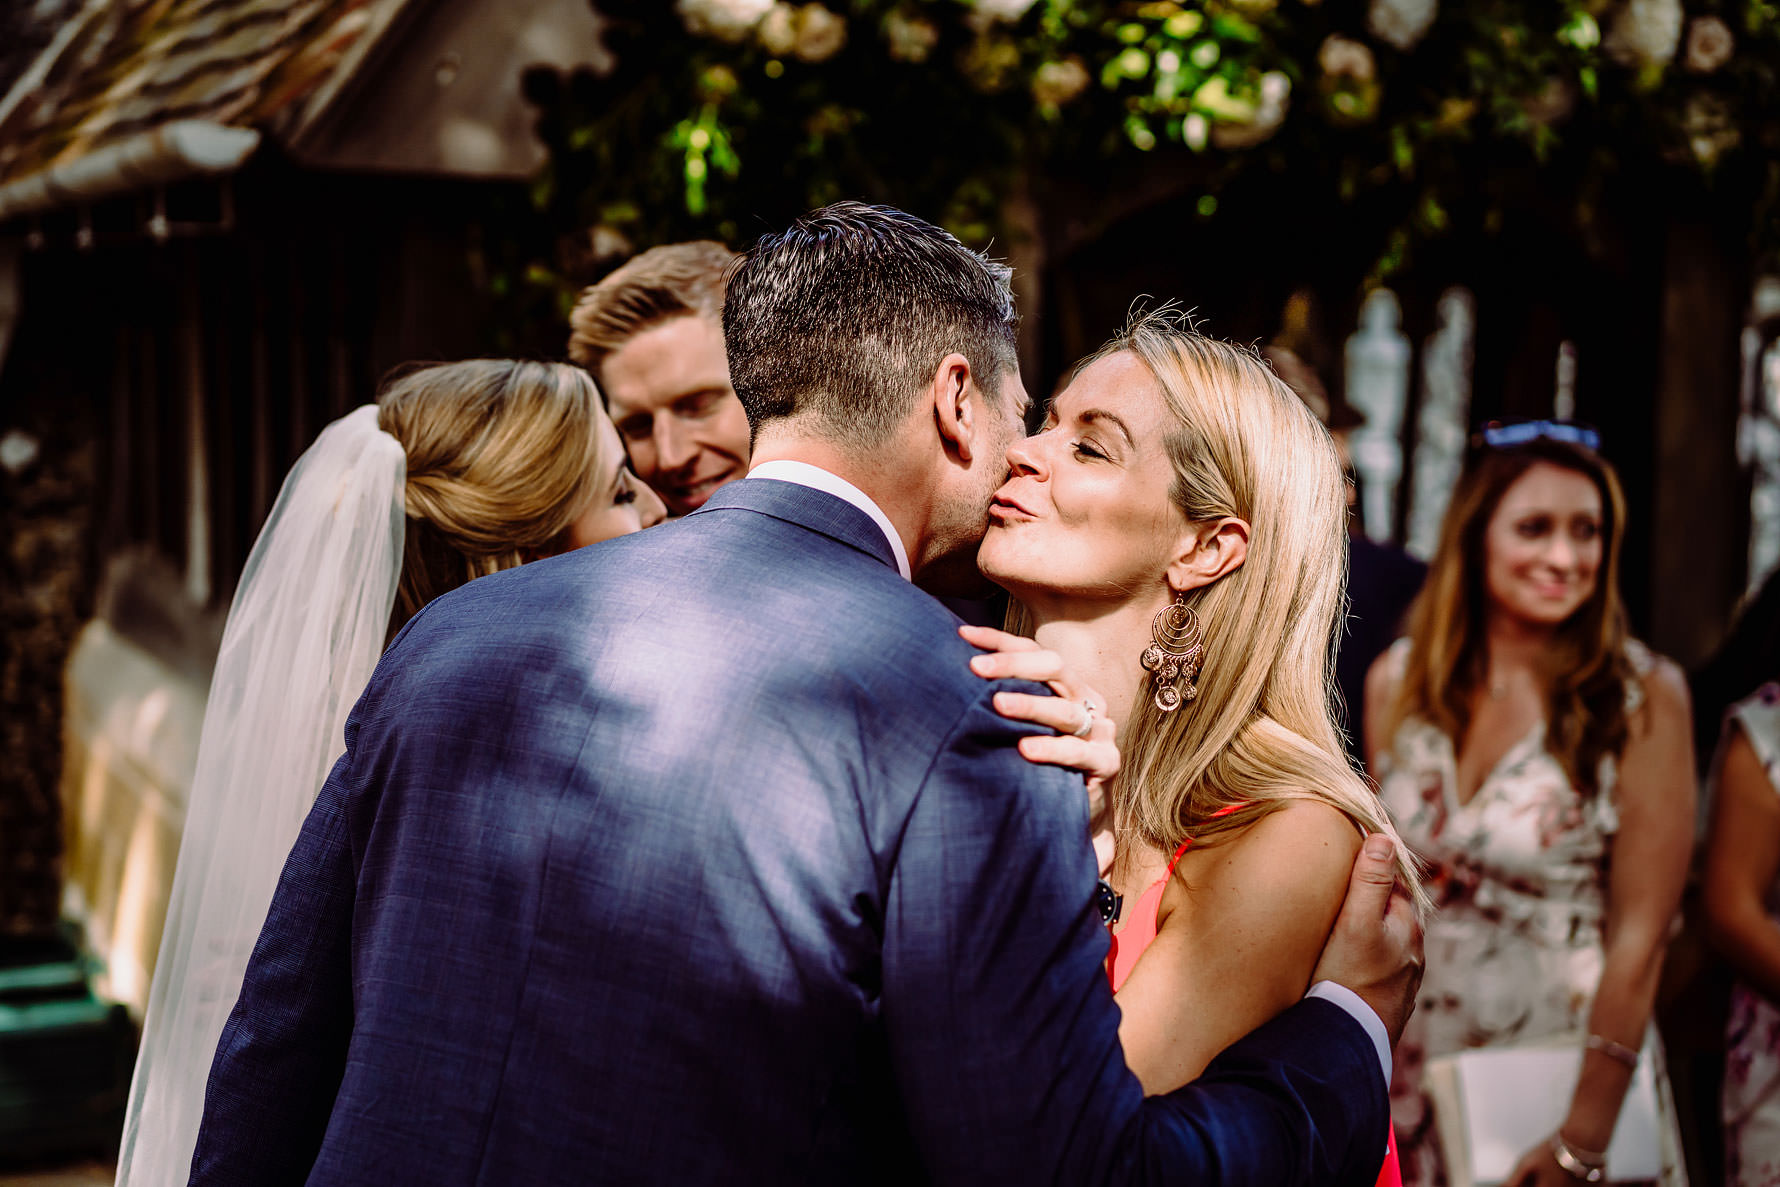 reportage wedding photo